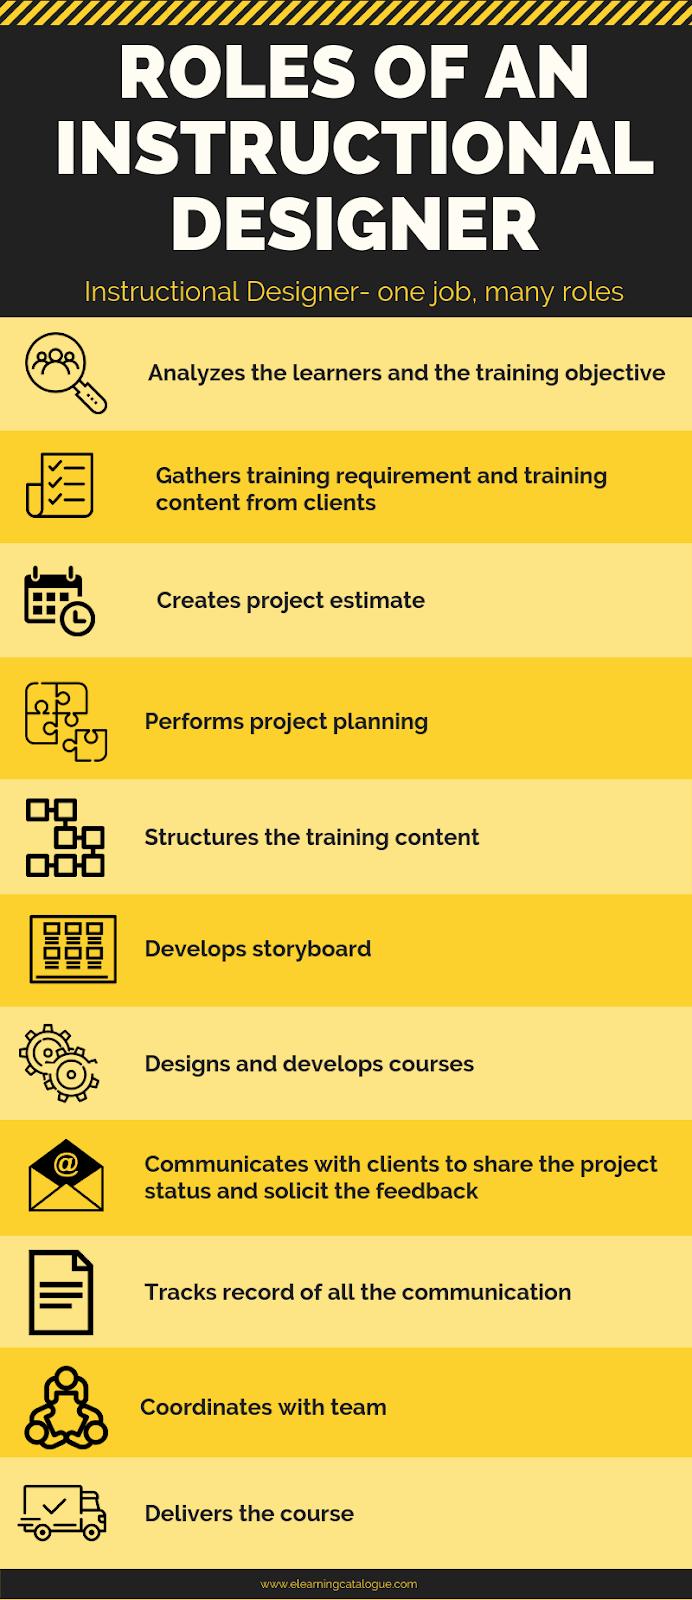 roles of instructional designer